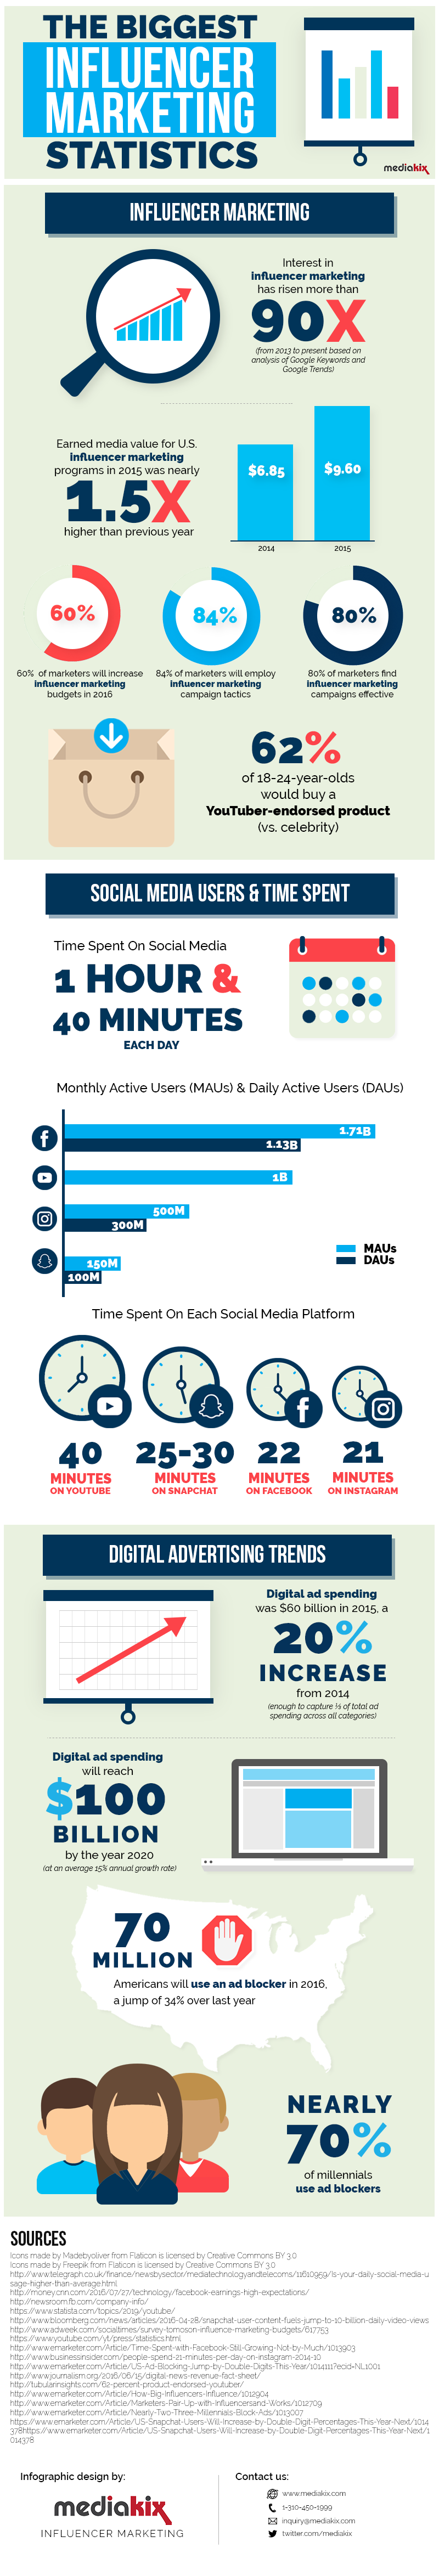 Top 10 Biggest Influencer Marketing Statistics For 2016 Infographic